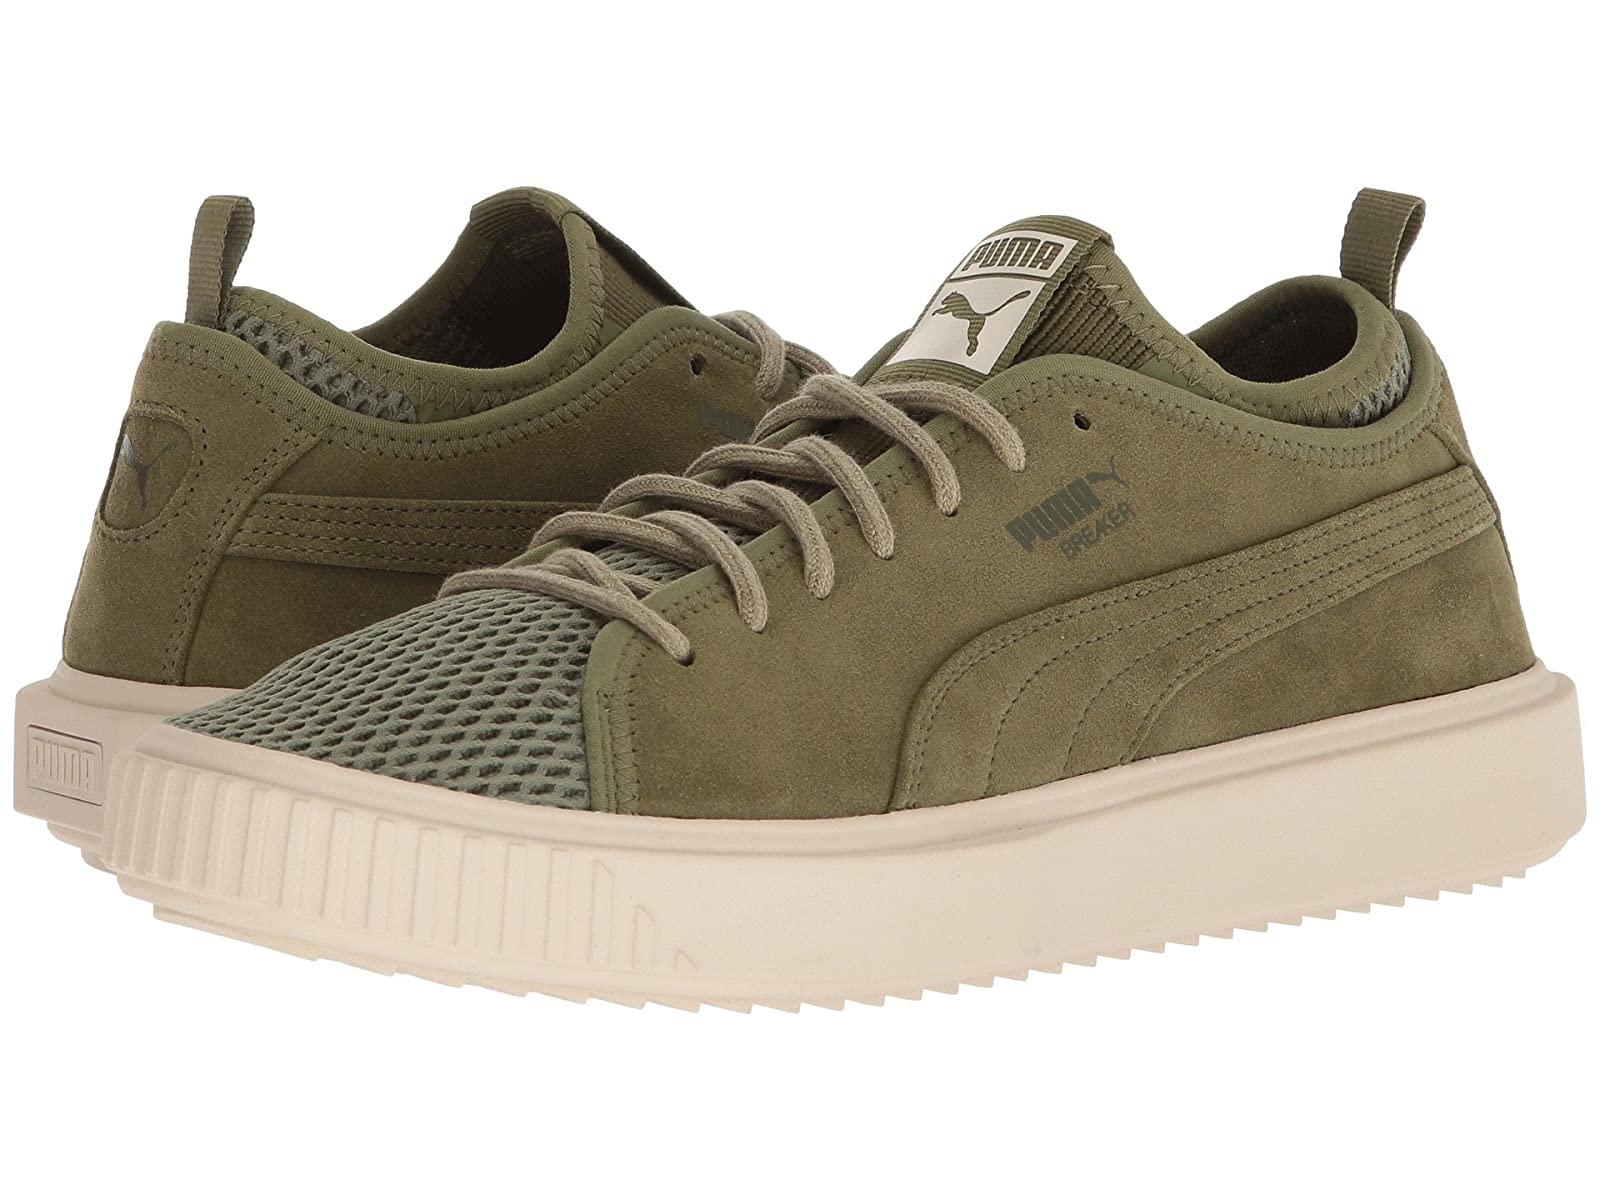 PUMA Breaker Mesh Q2Cheap and distinctive eye-catching shoes